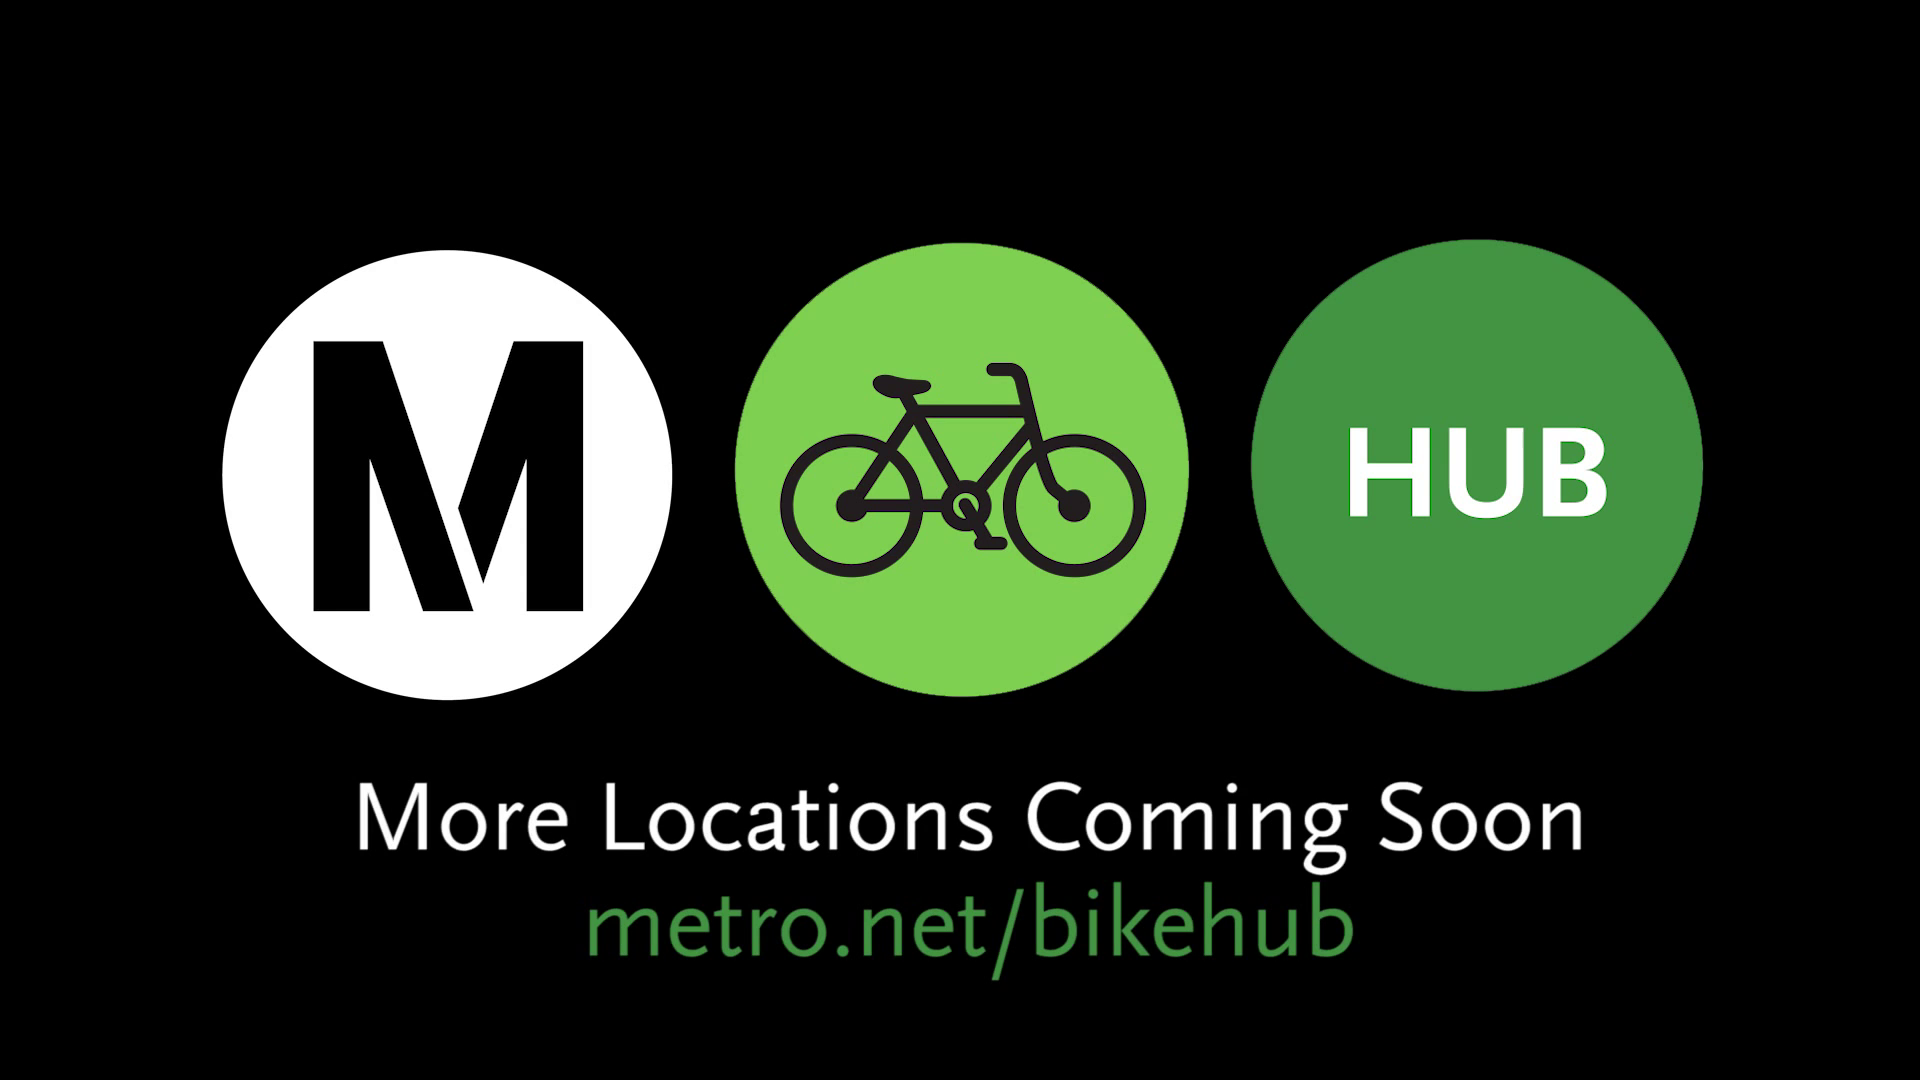 More Metro Bike Hubs are coming!